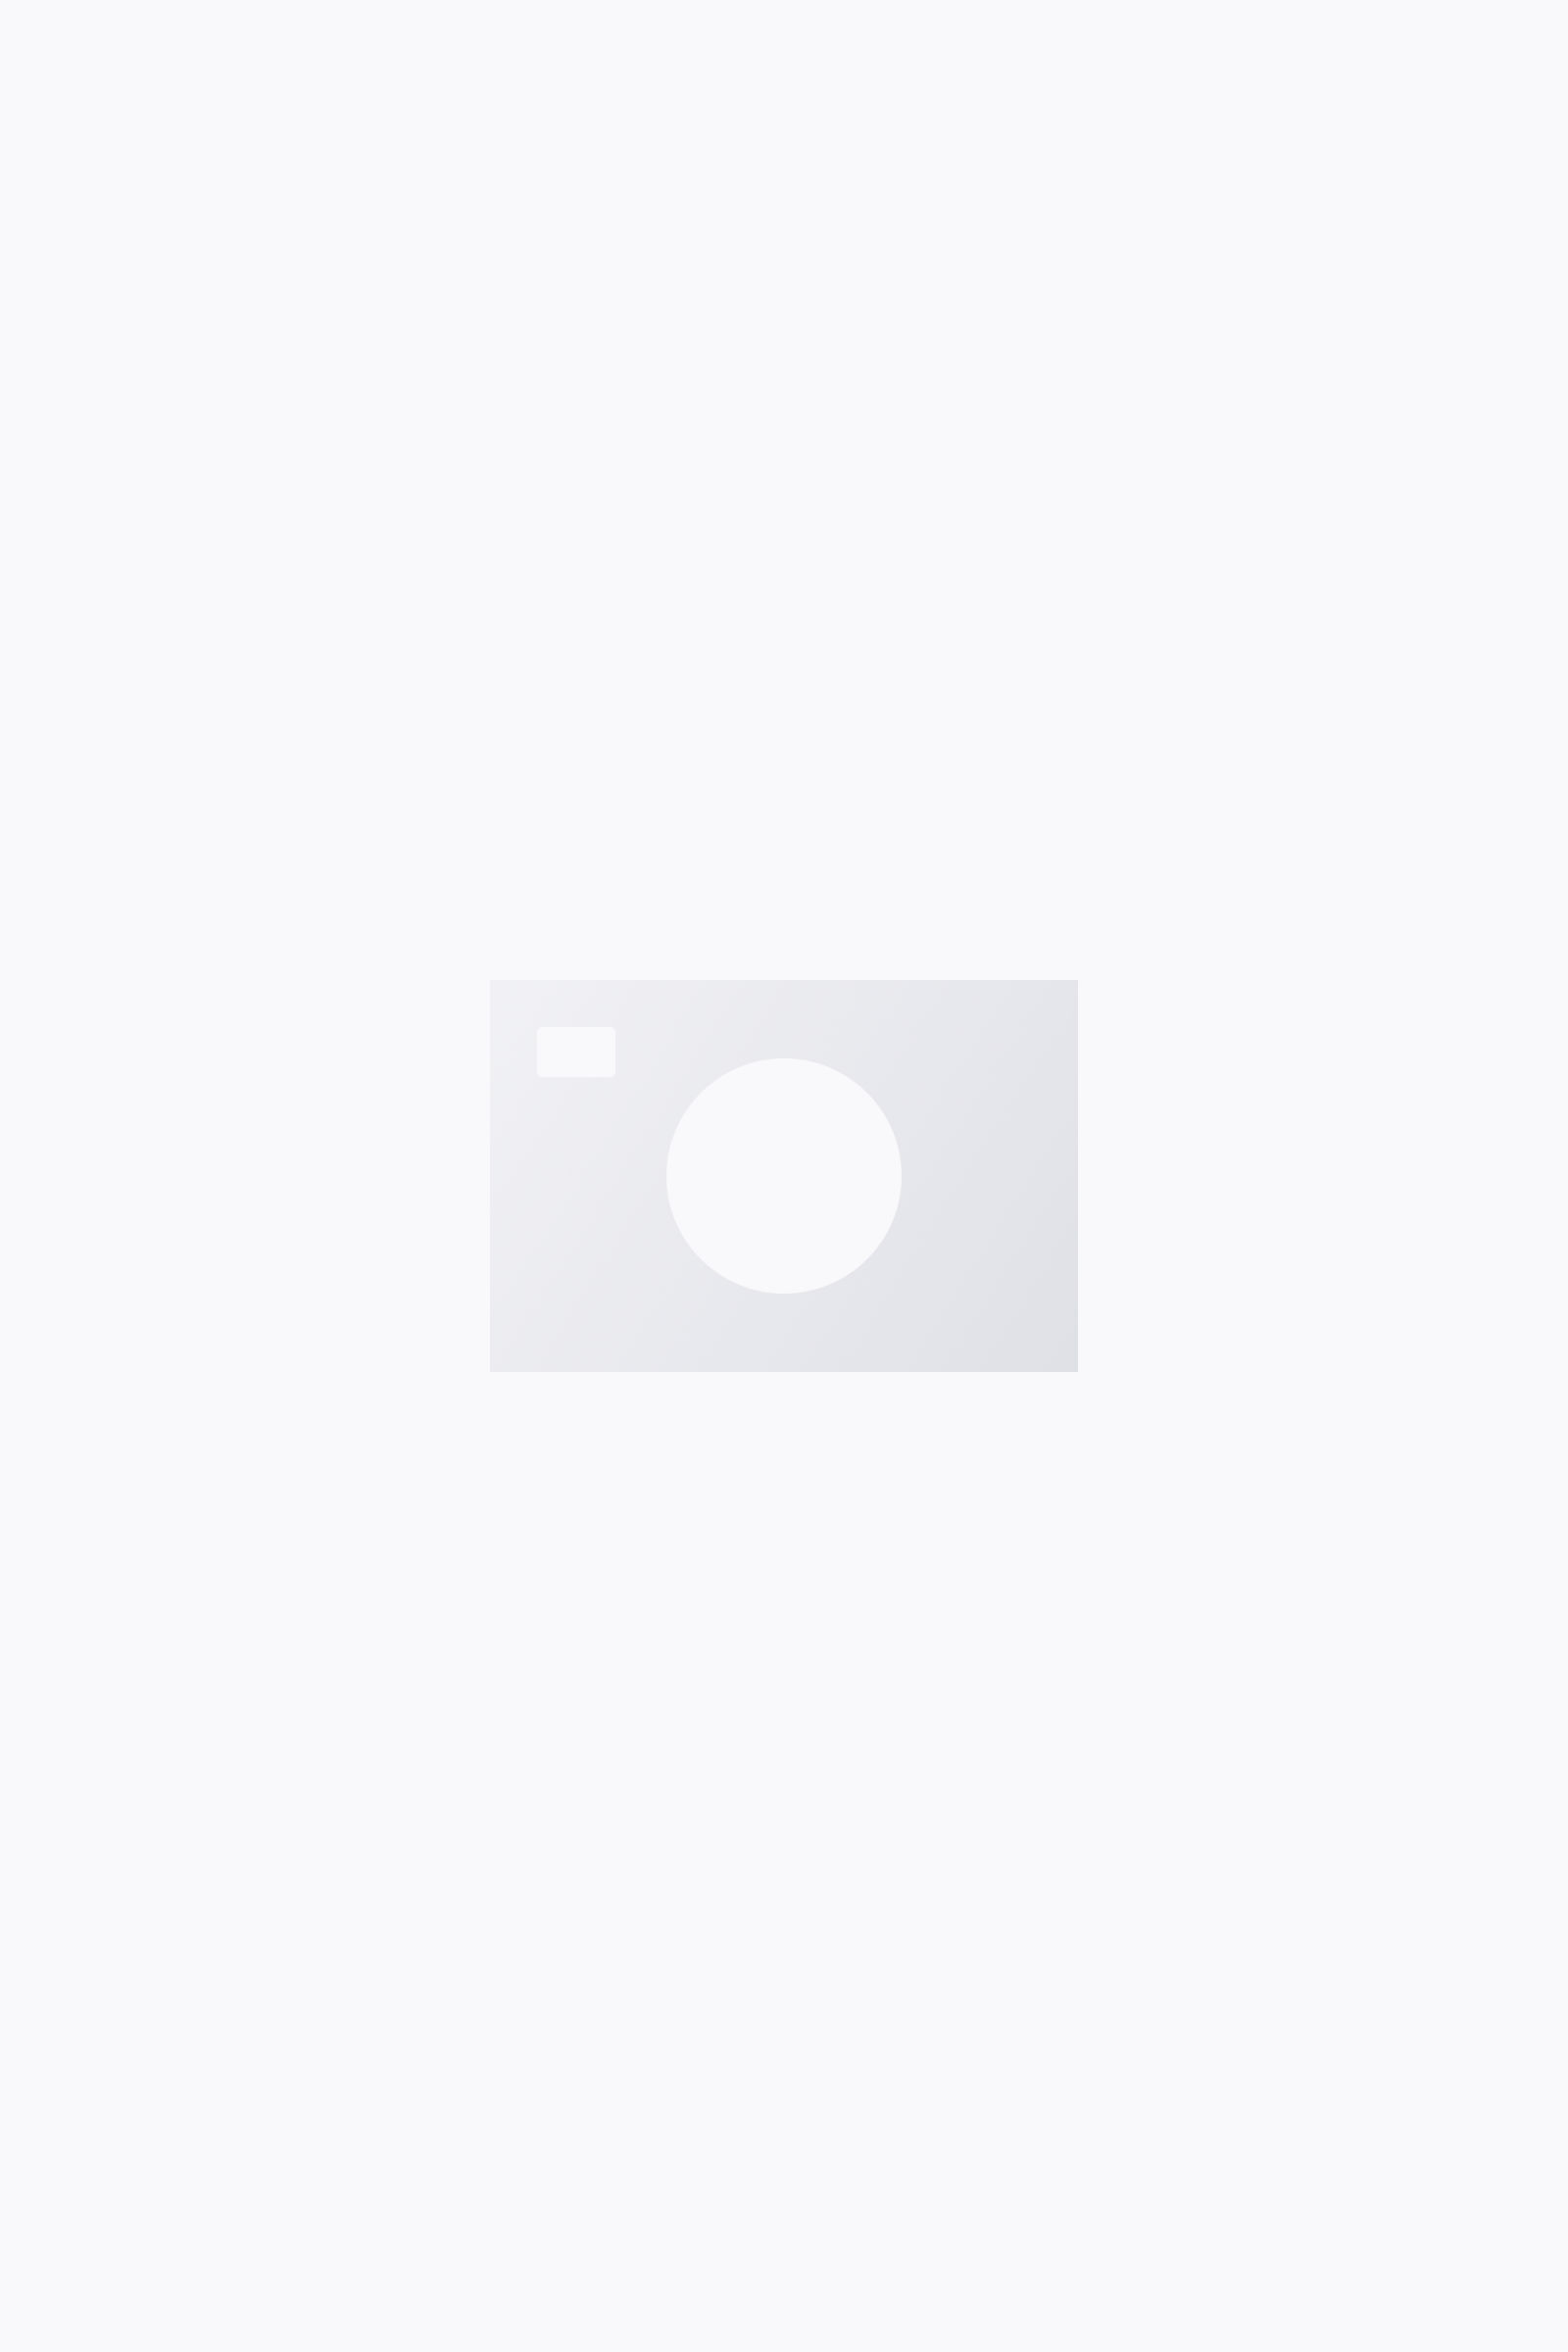 COS REGULAR-FIT T-SHIRT,white